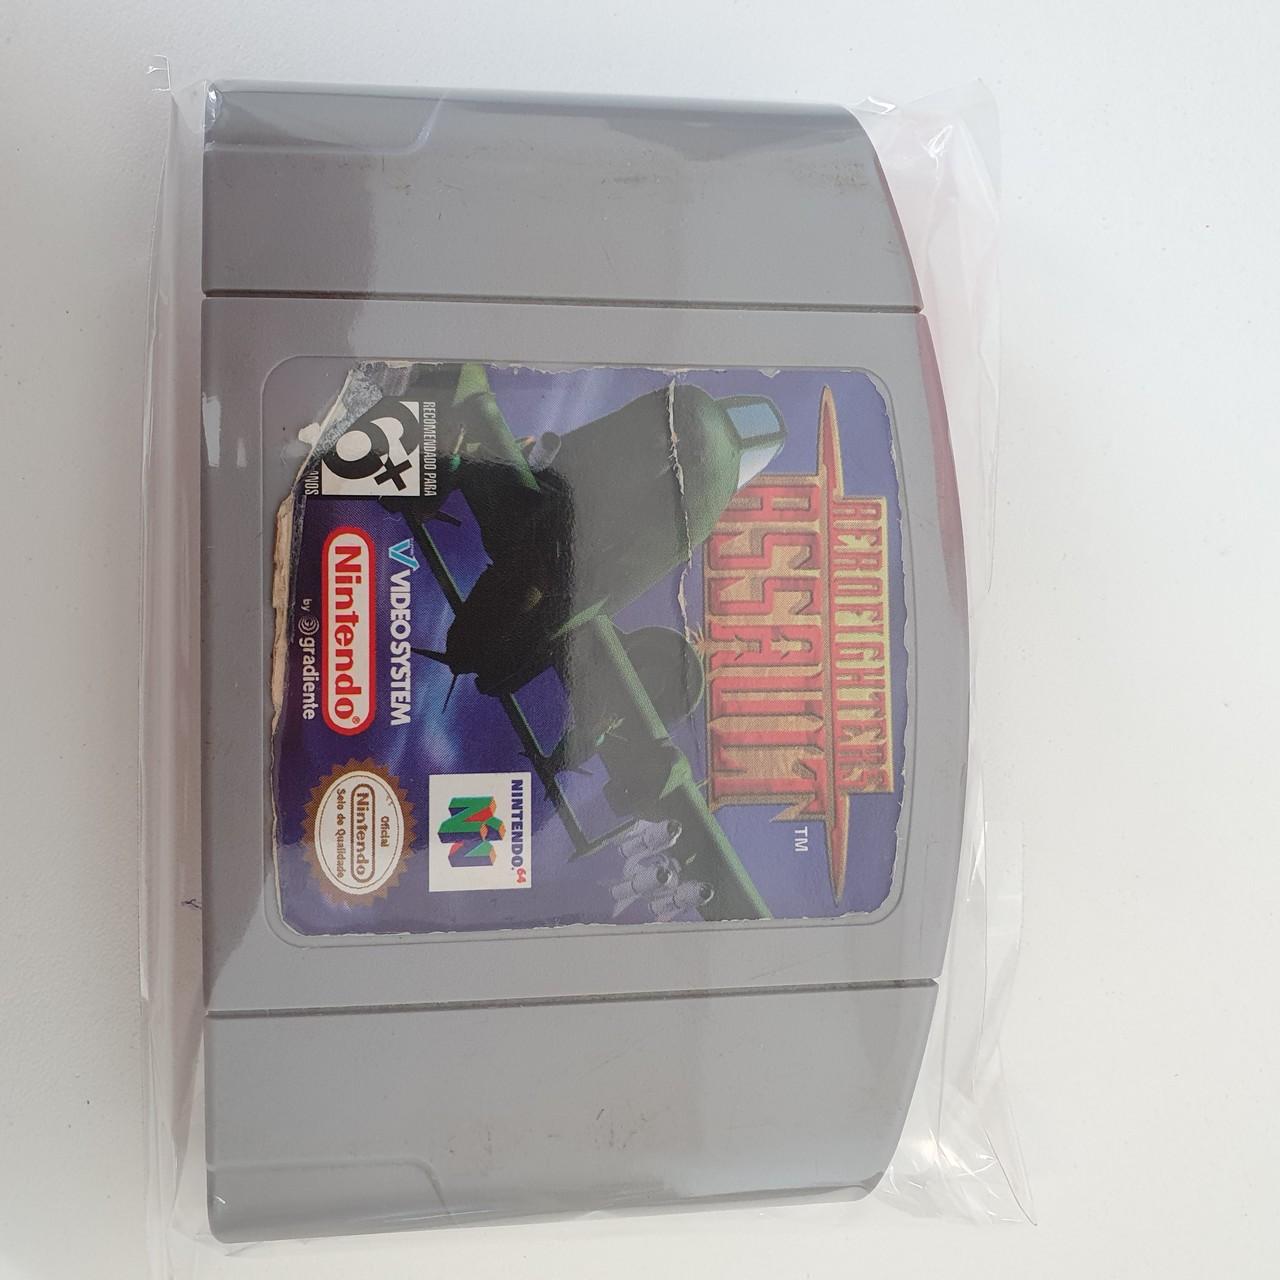 Aerofighters Assault - Cartucho - Nintendo 64 - Usado